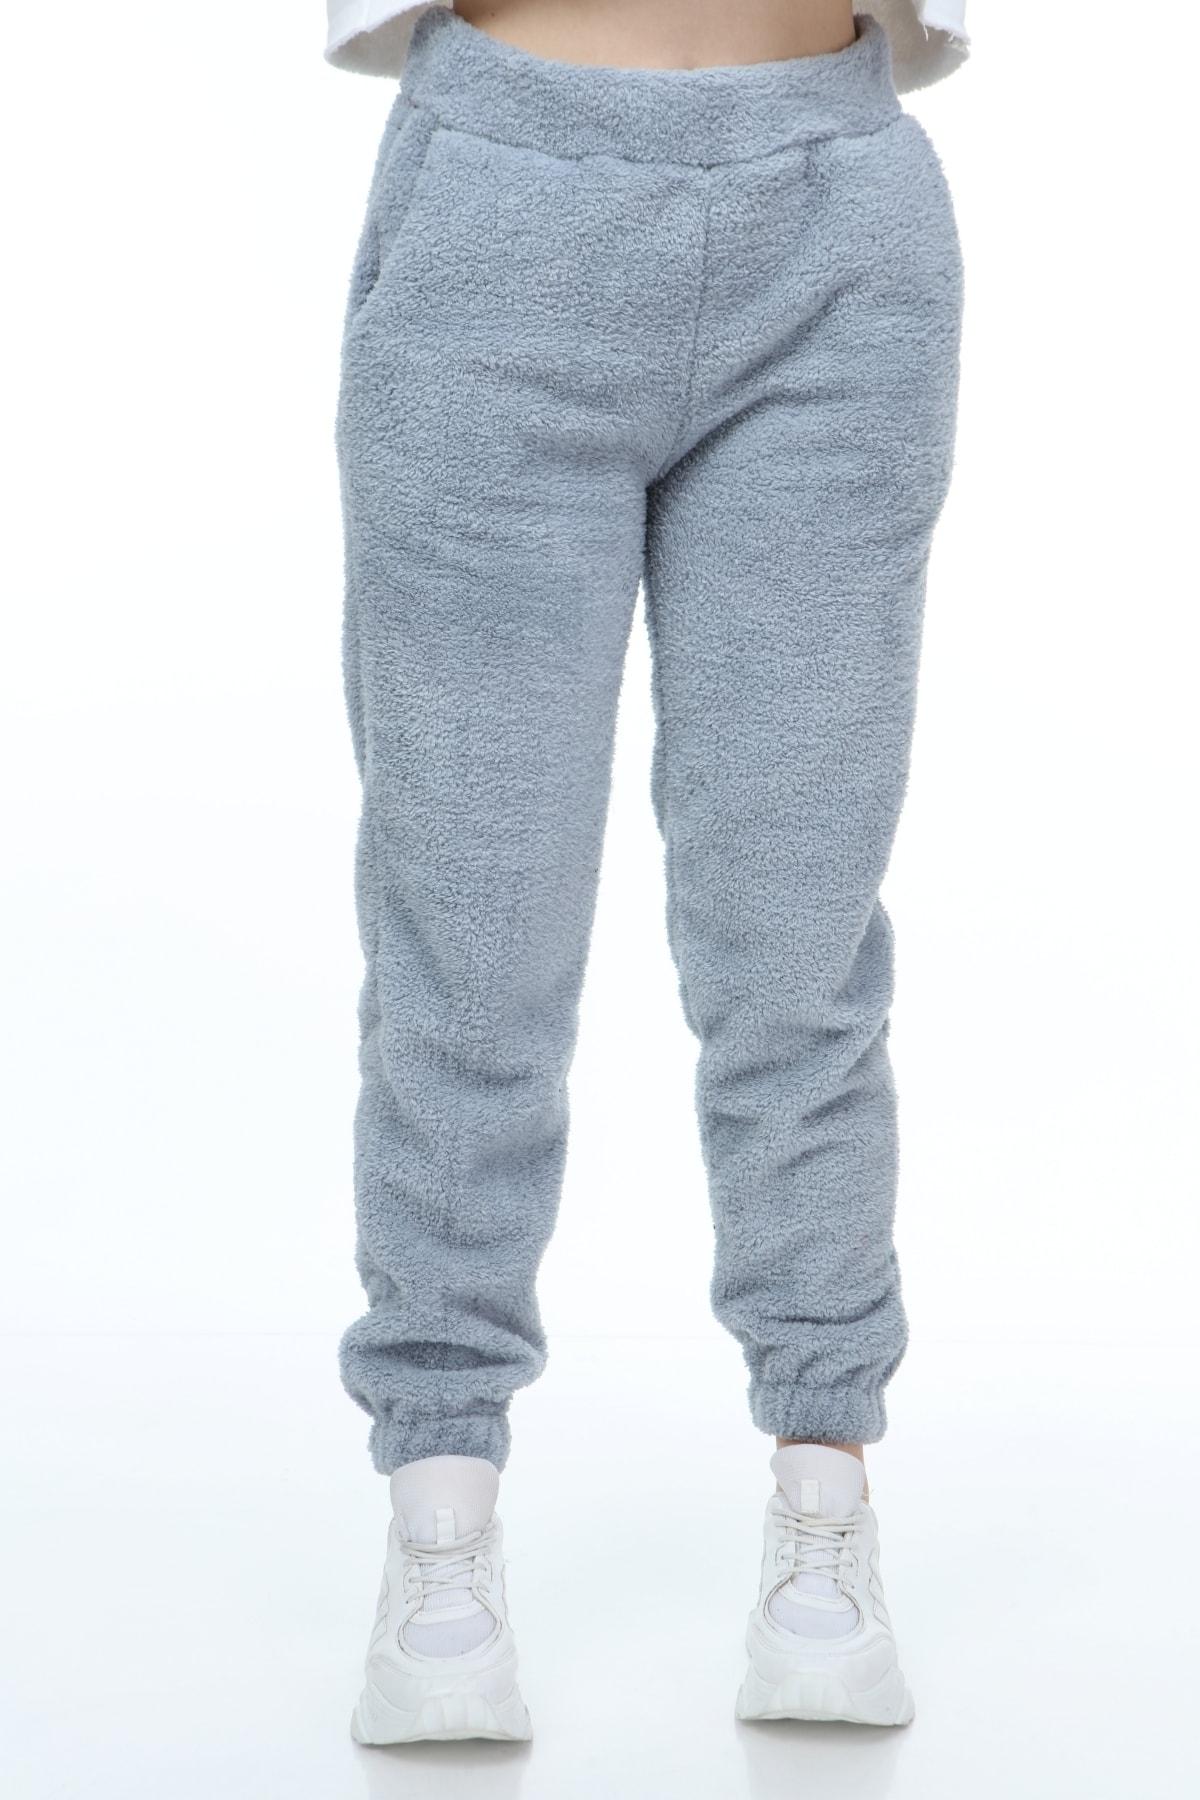 SENTEX Welsoft Cepli Pantalon 1